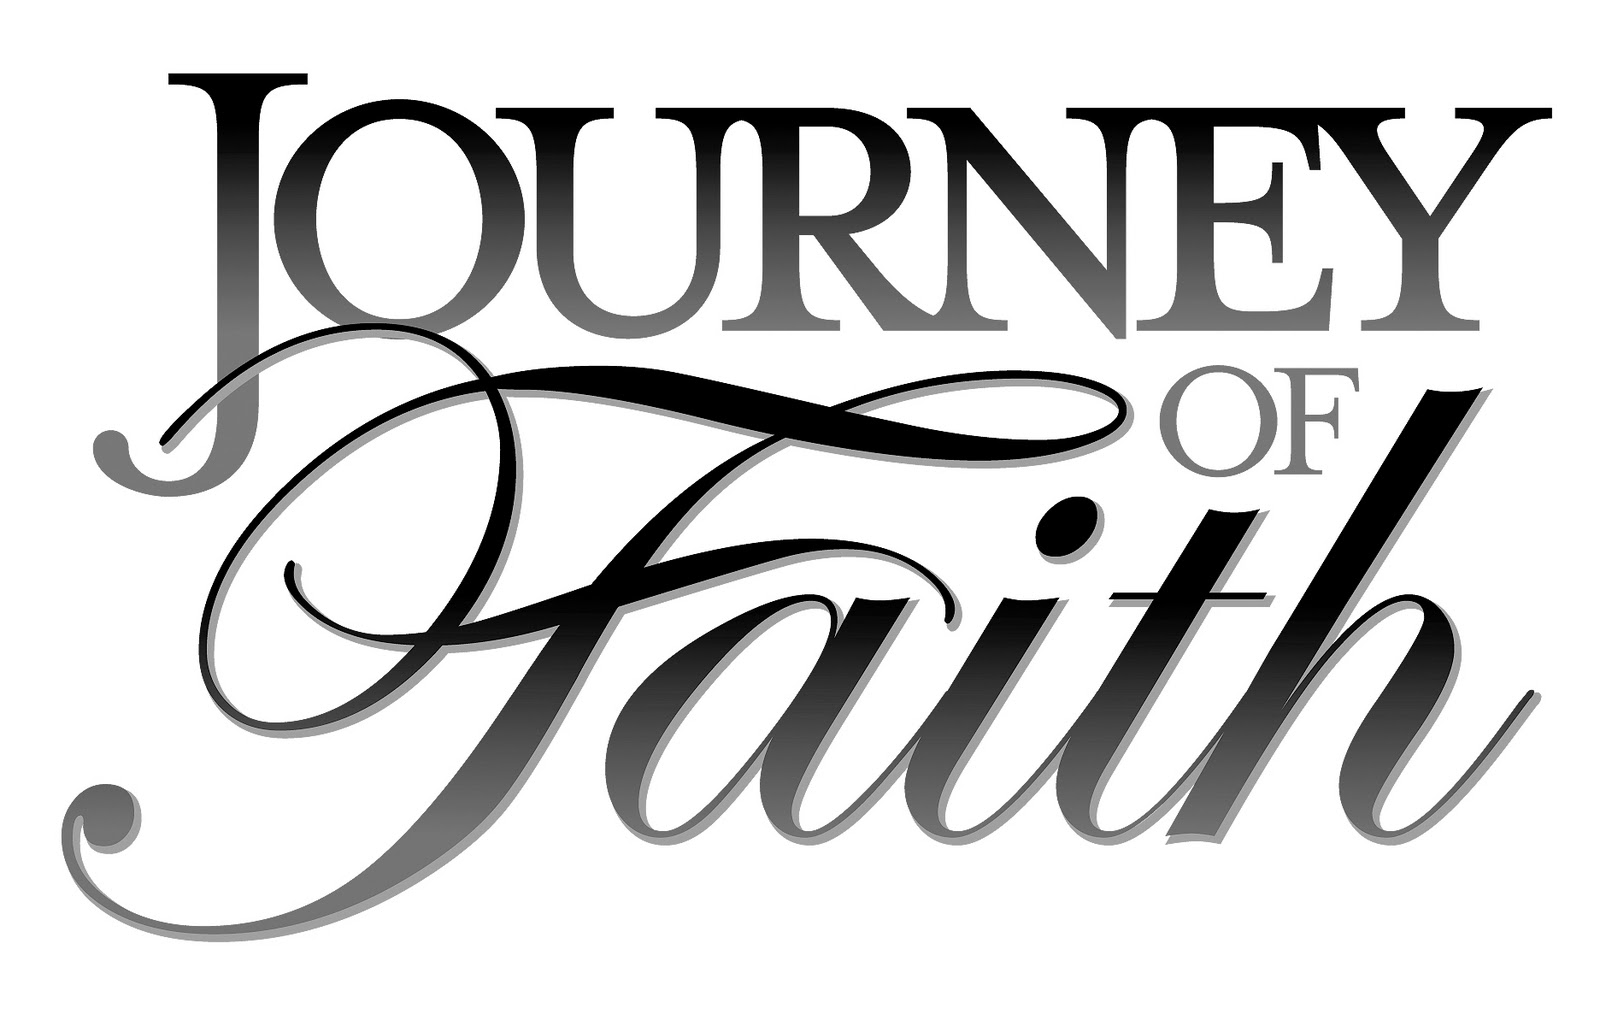 image journey of faith clip art title bw jpeg jpg the vampire rh vampirediaries wikia com  ash wednesday clipart free